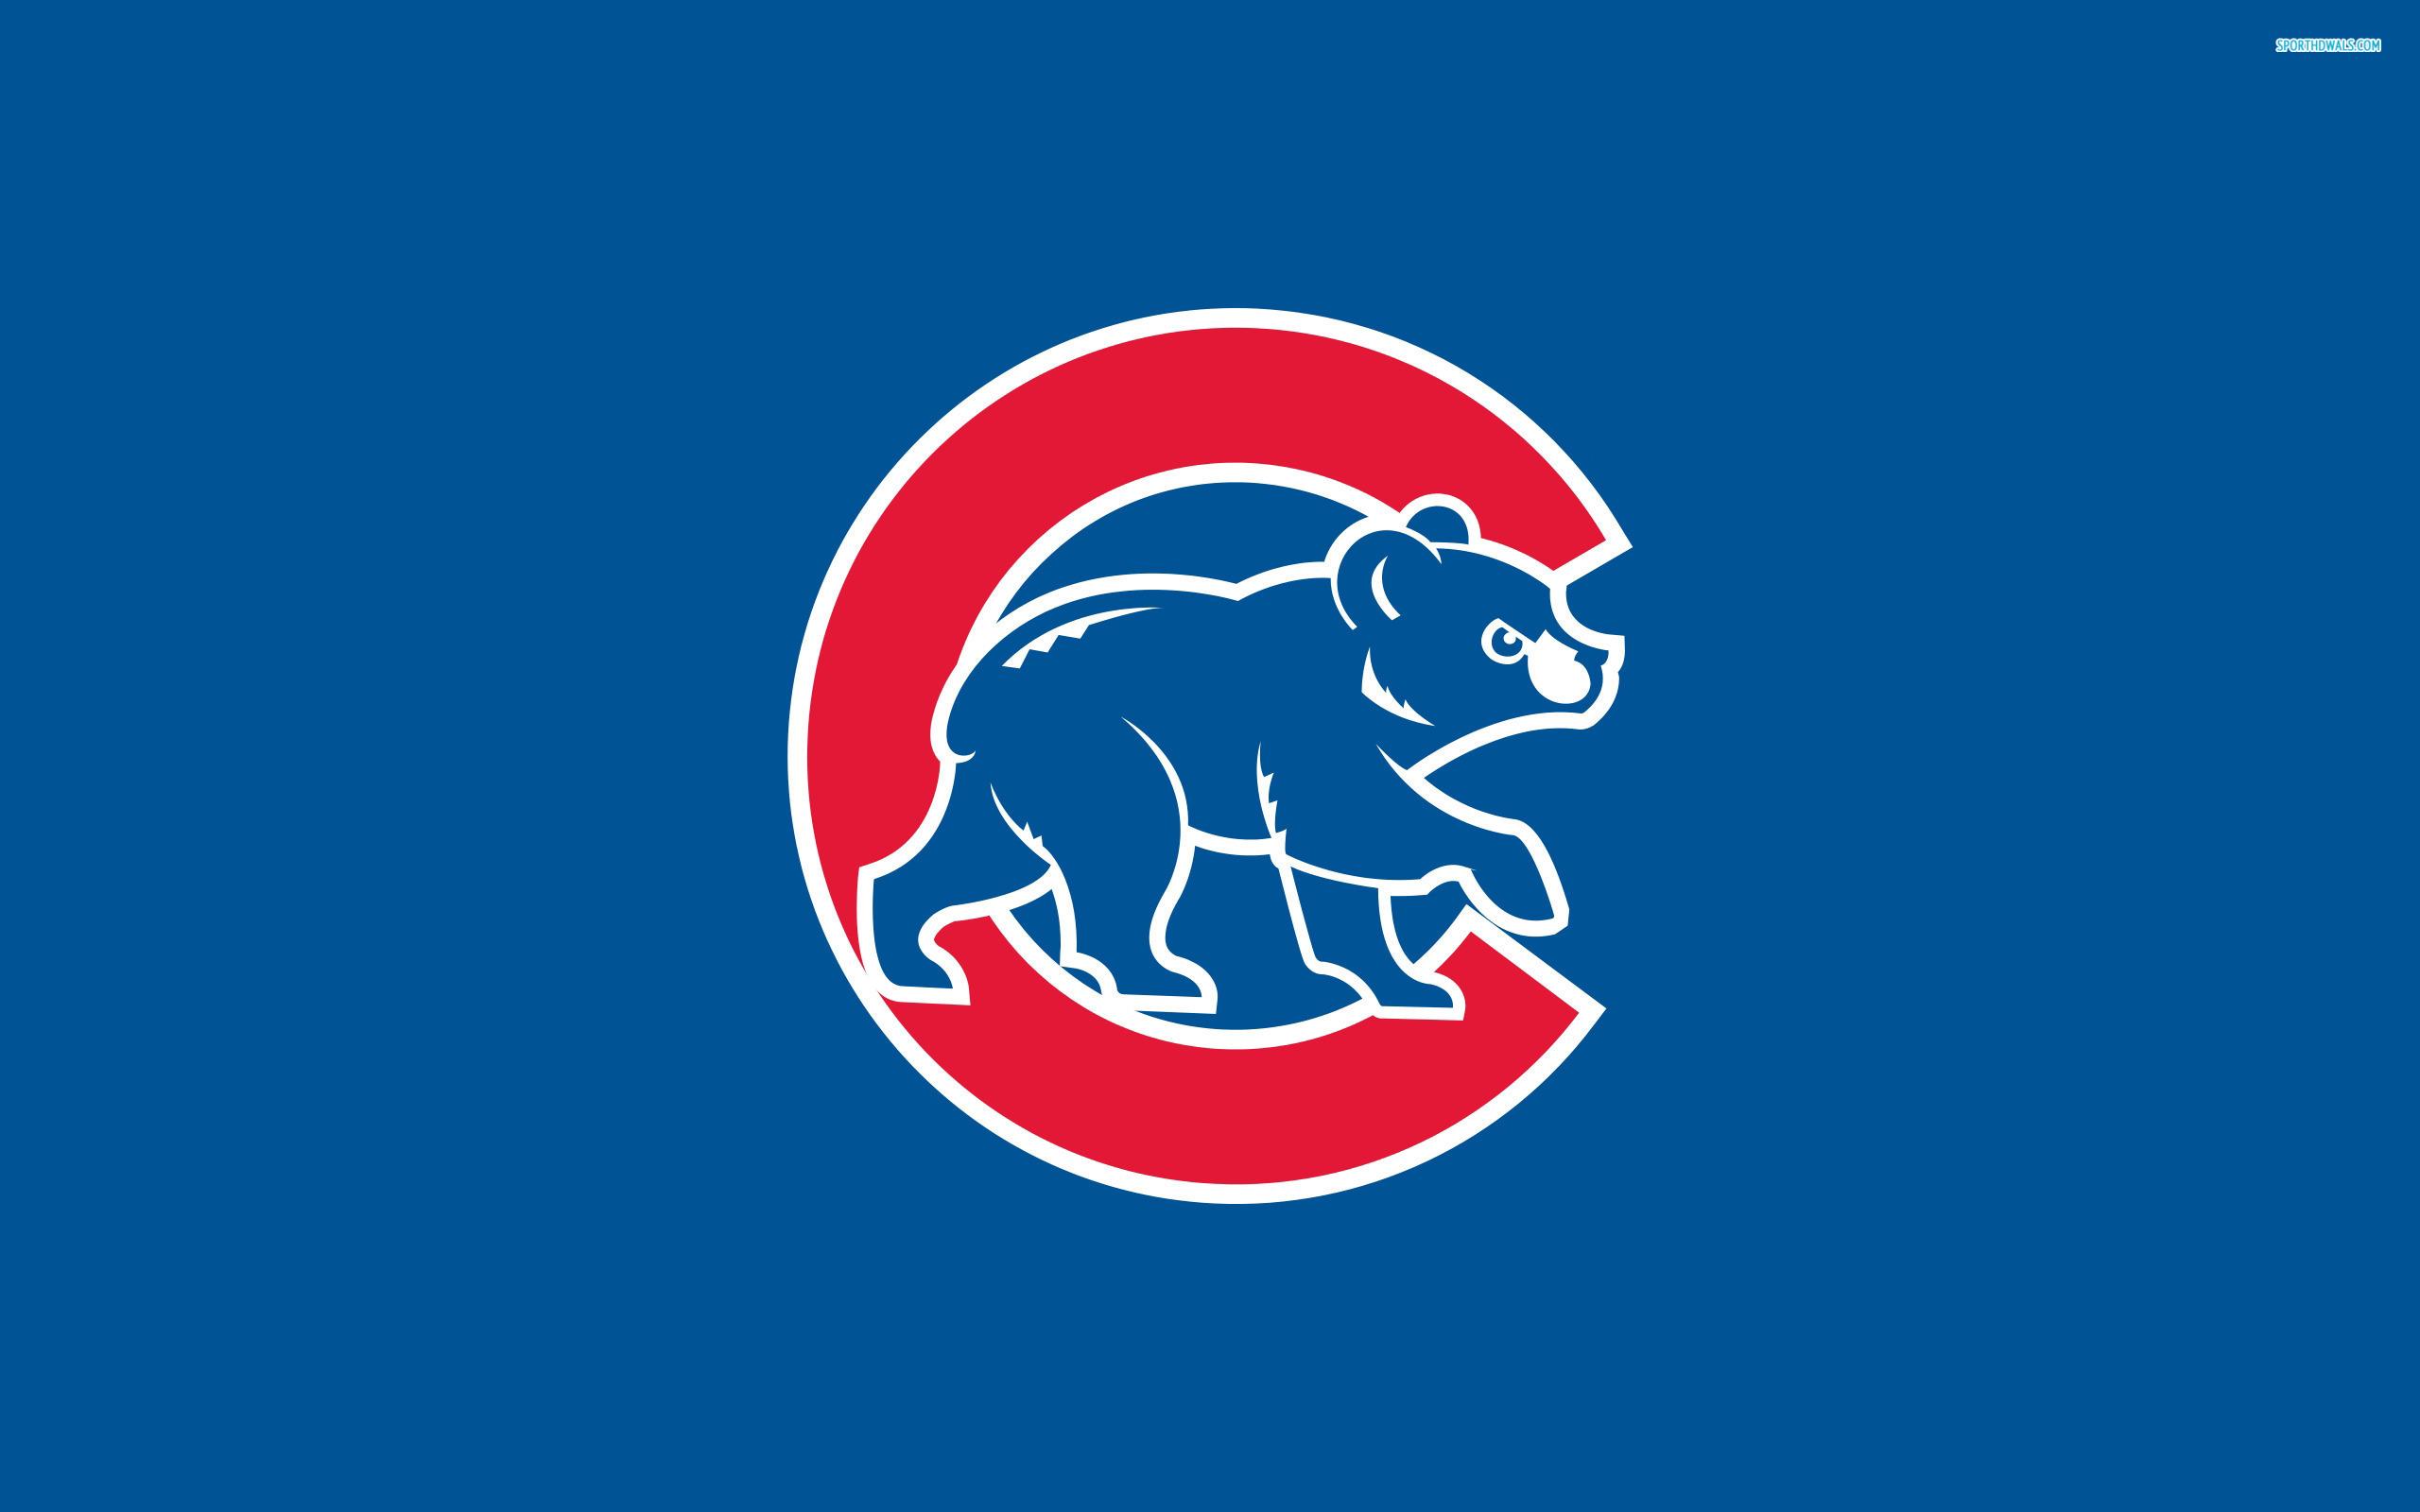 Chicago Cubs 2016 Wallpaper Wallpapersafari